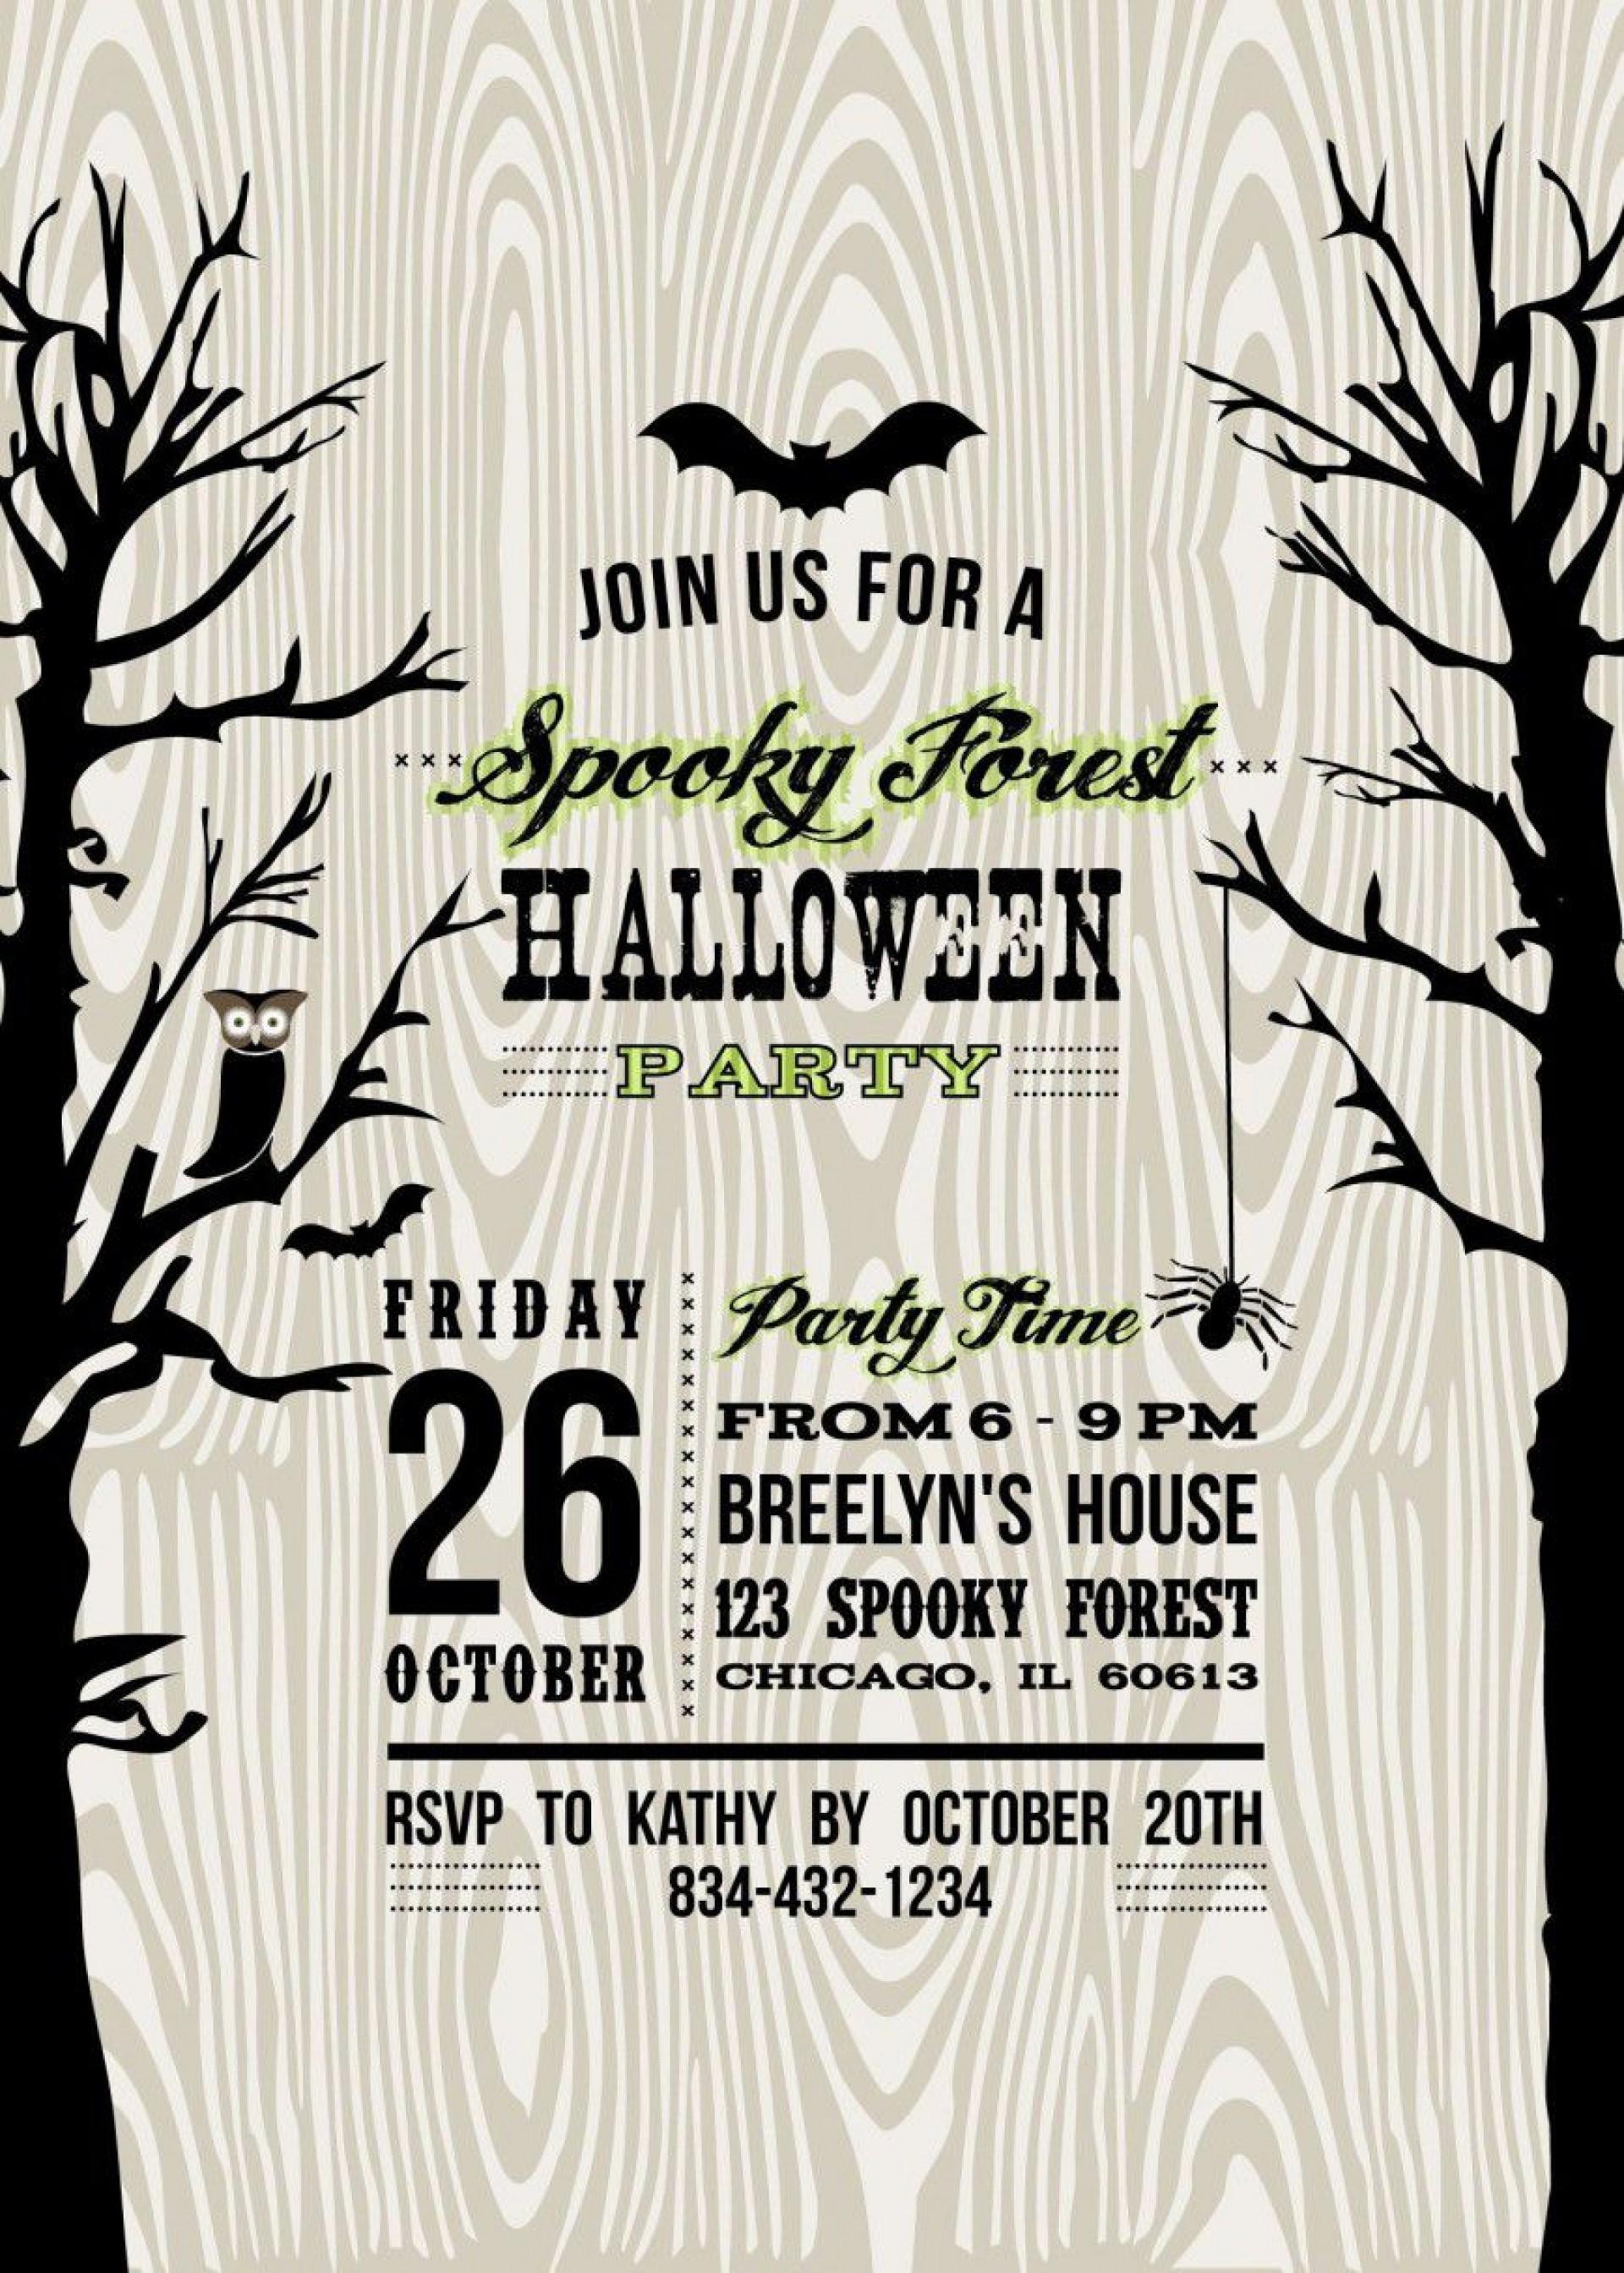 000 Shocking Free Halloween Invitation Template High Def  Templates Microsoft Word Wedding Printable Party1920